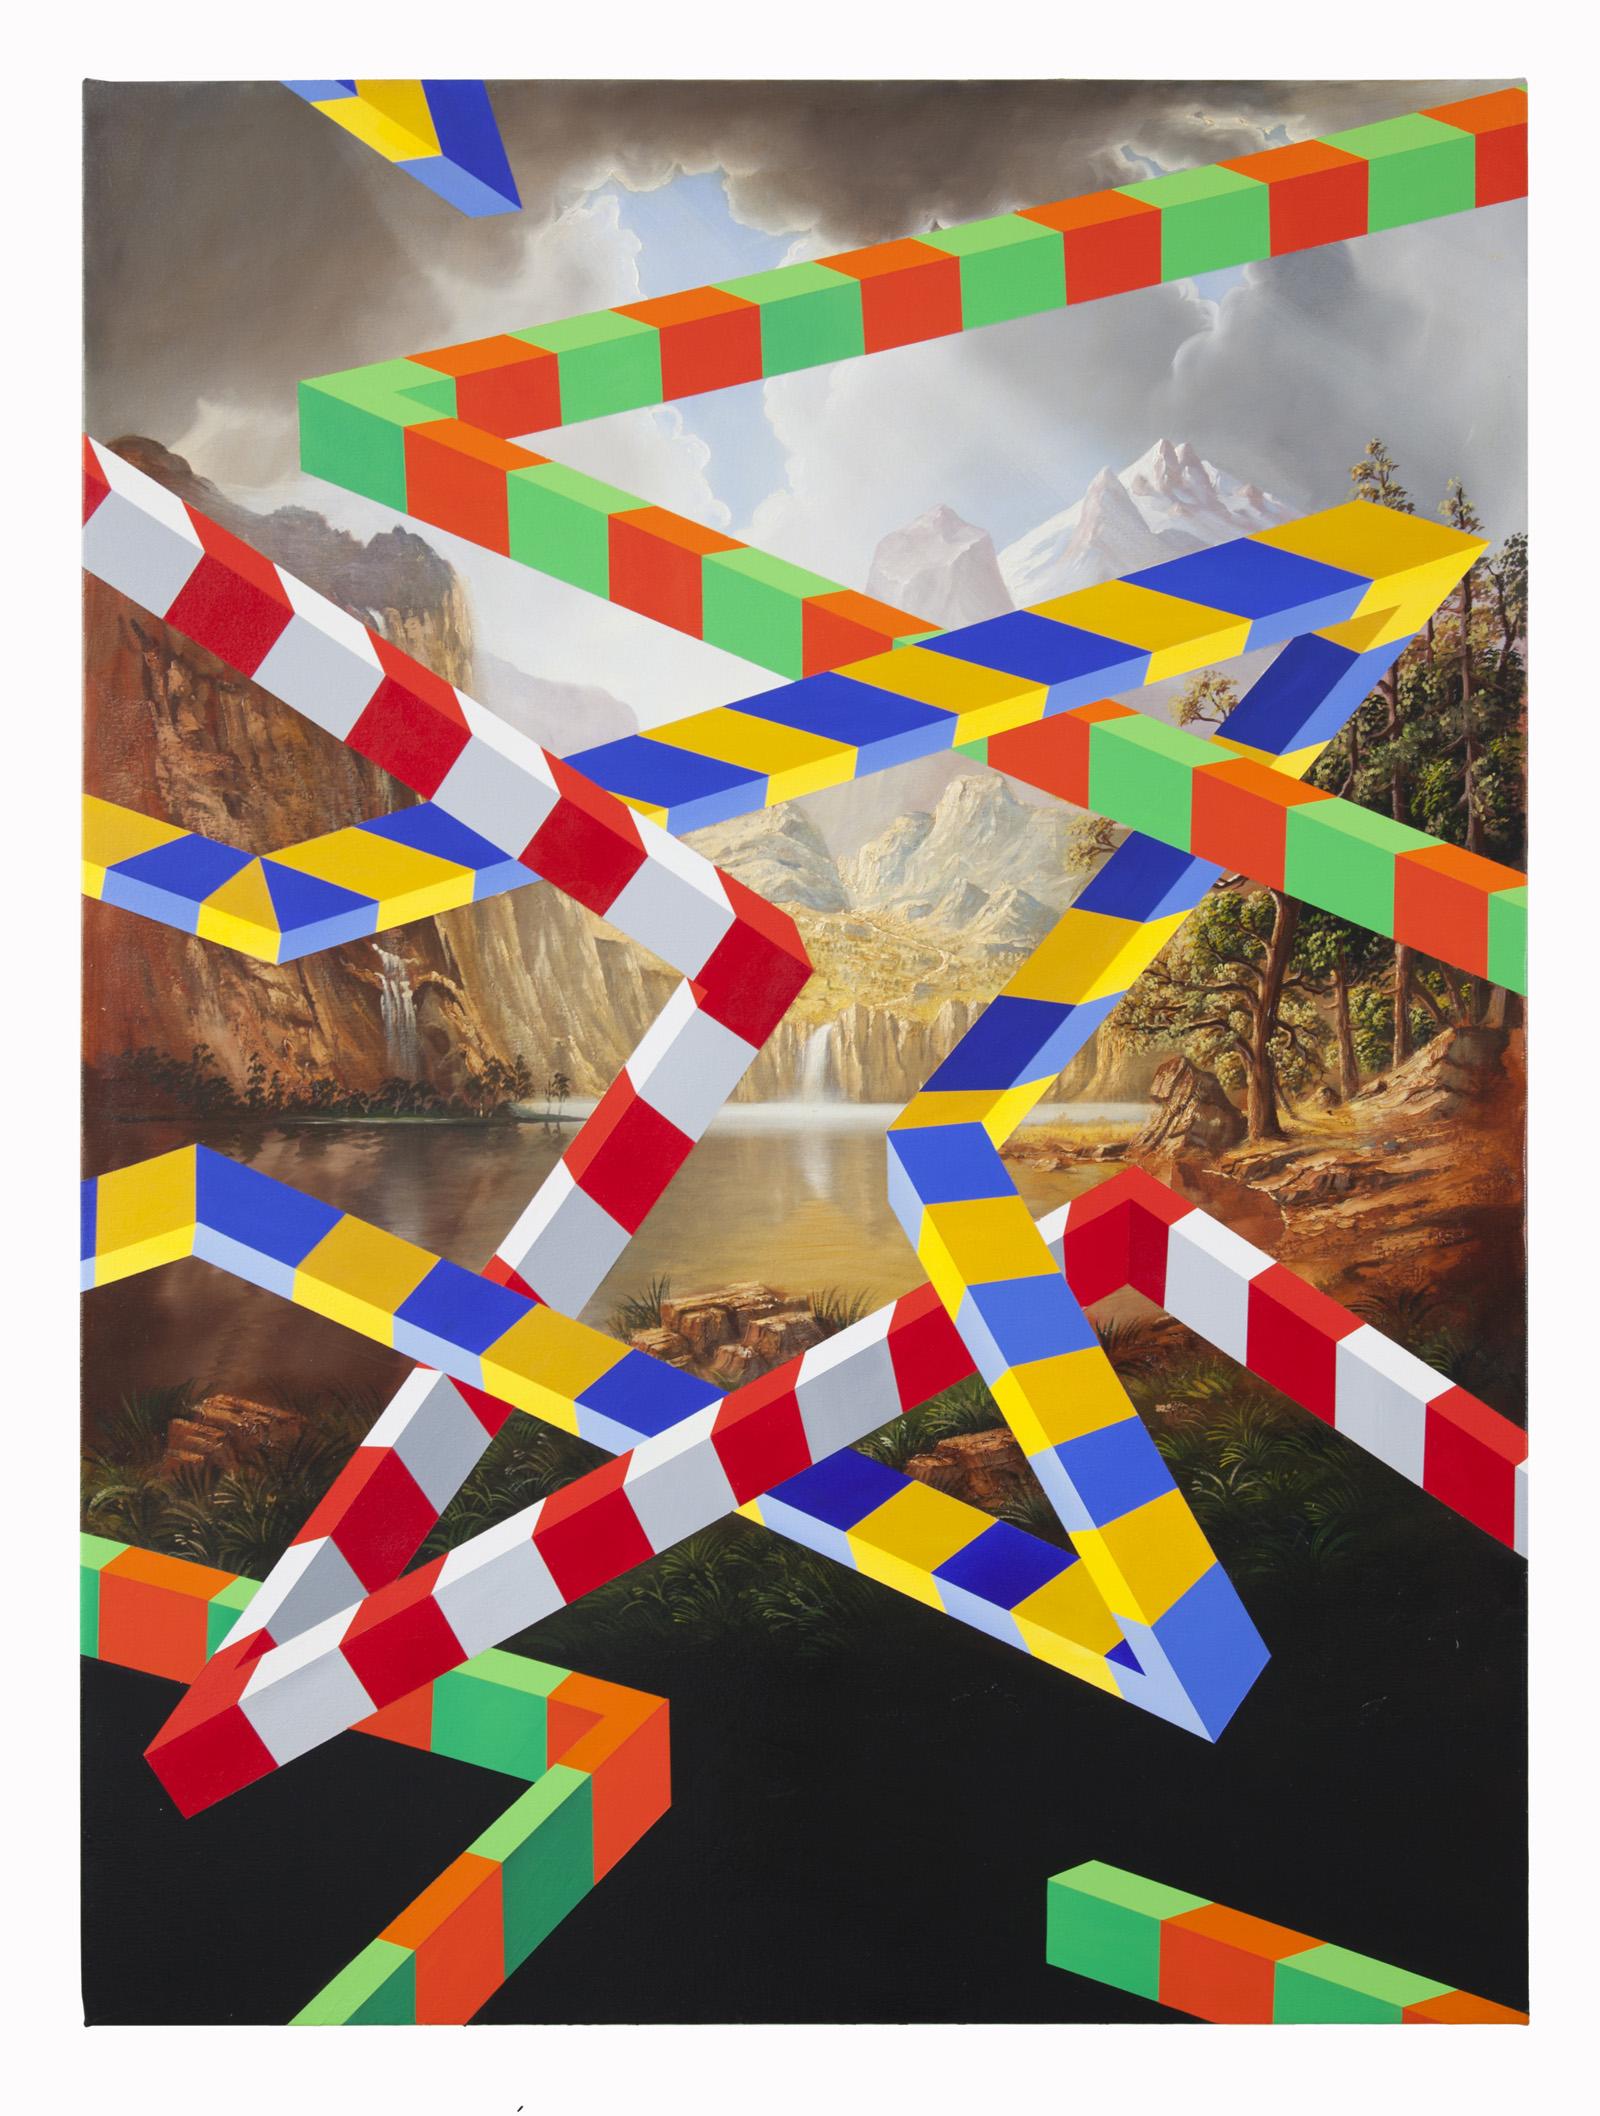 PETER DAVERINGTON   The Taconic  2018 Oil and acrylic on canvas 122 x 91 cm